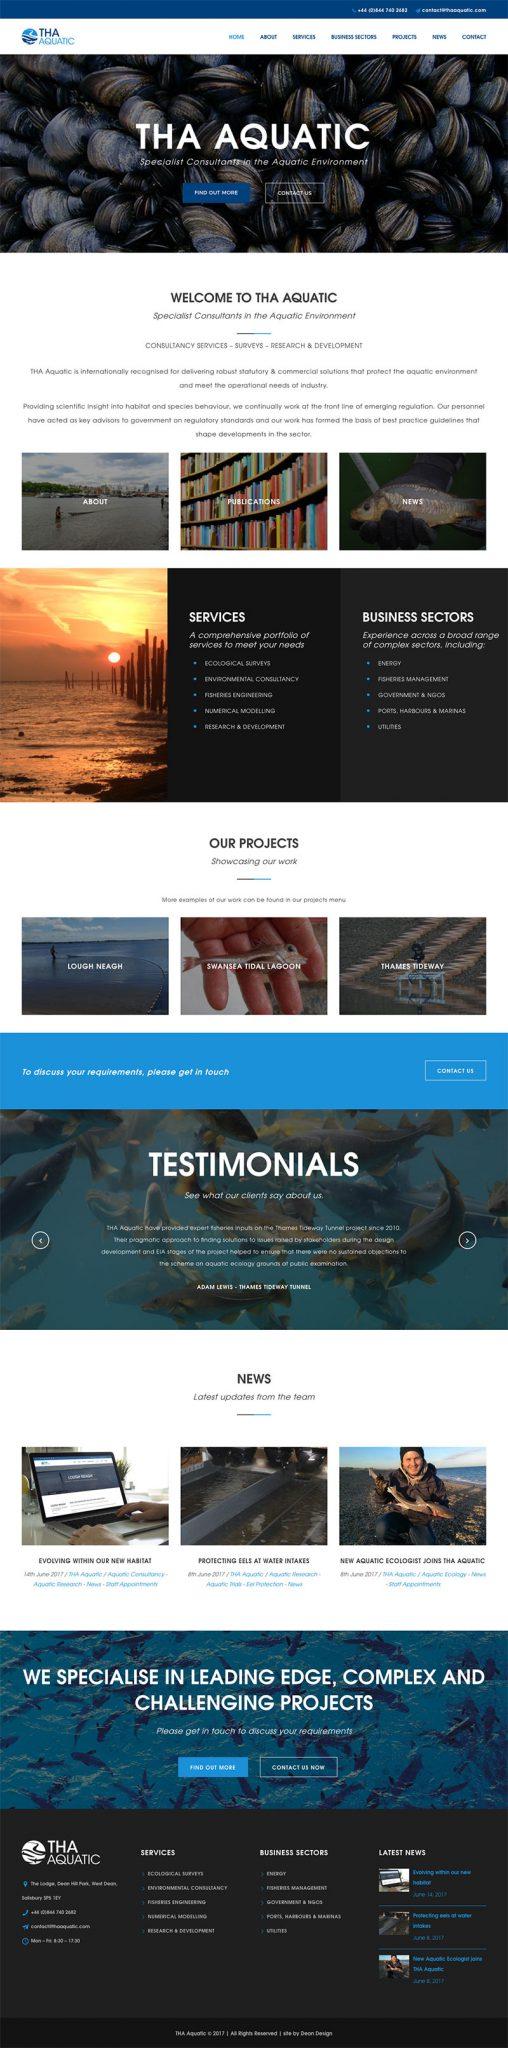 deon-design-thaaquatic-website-design